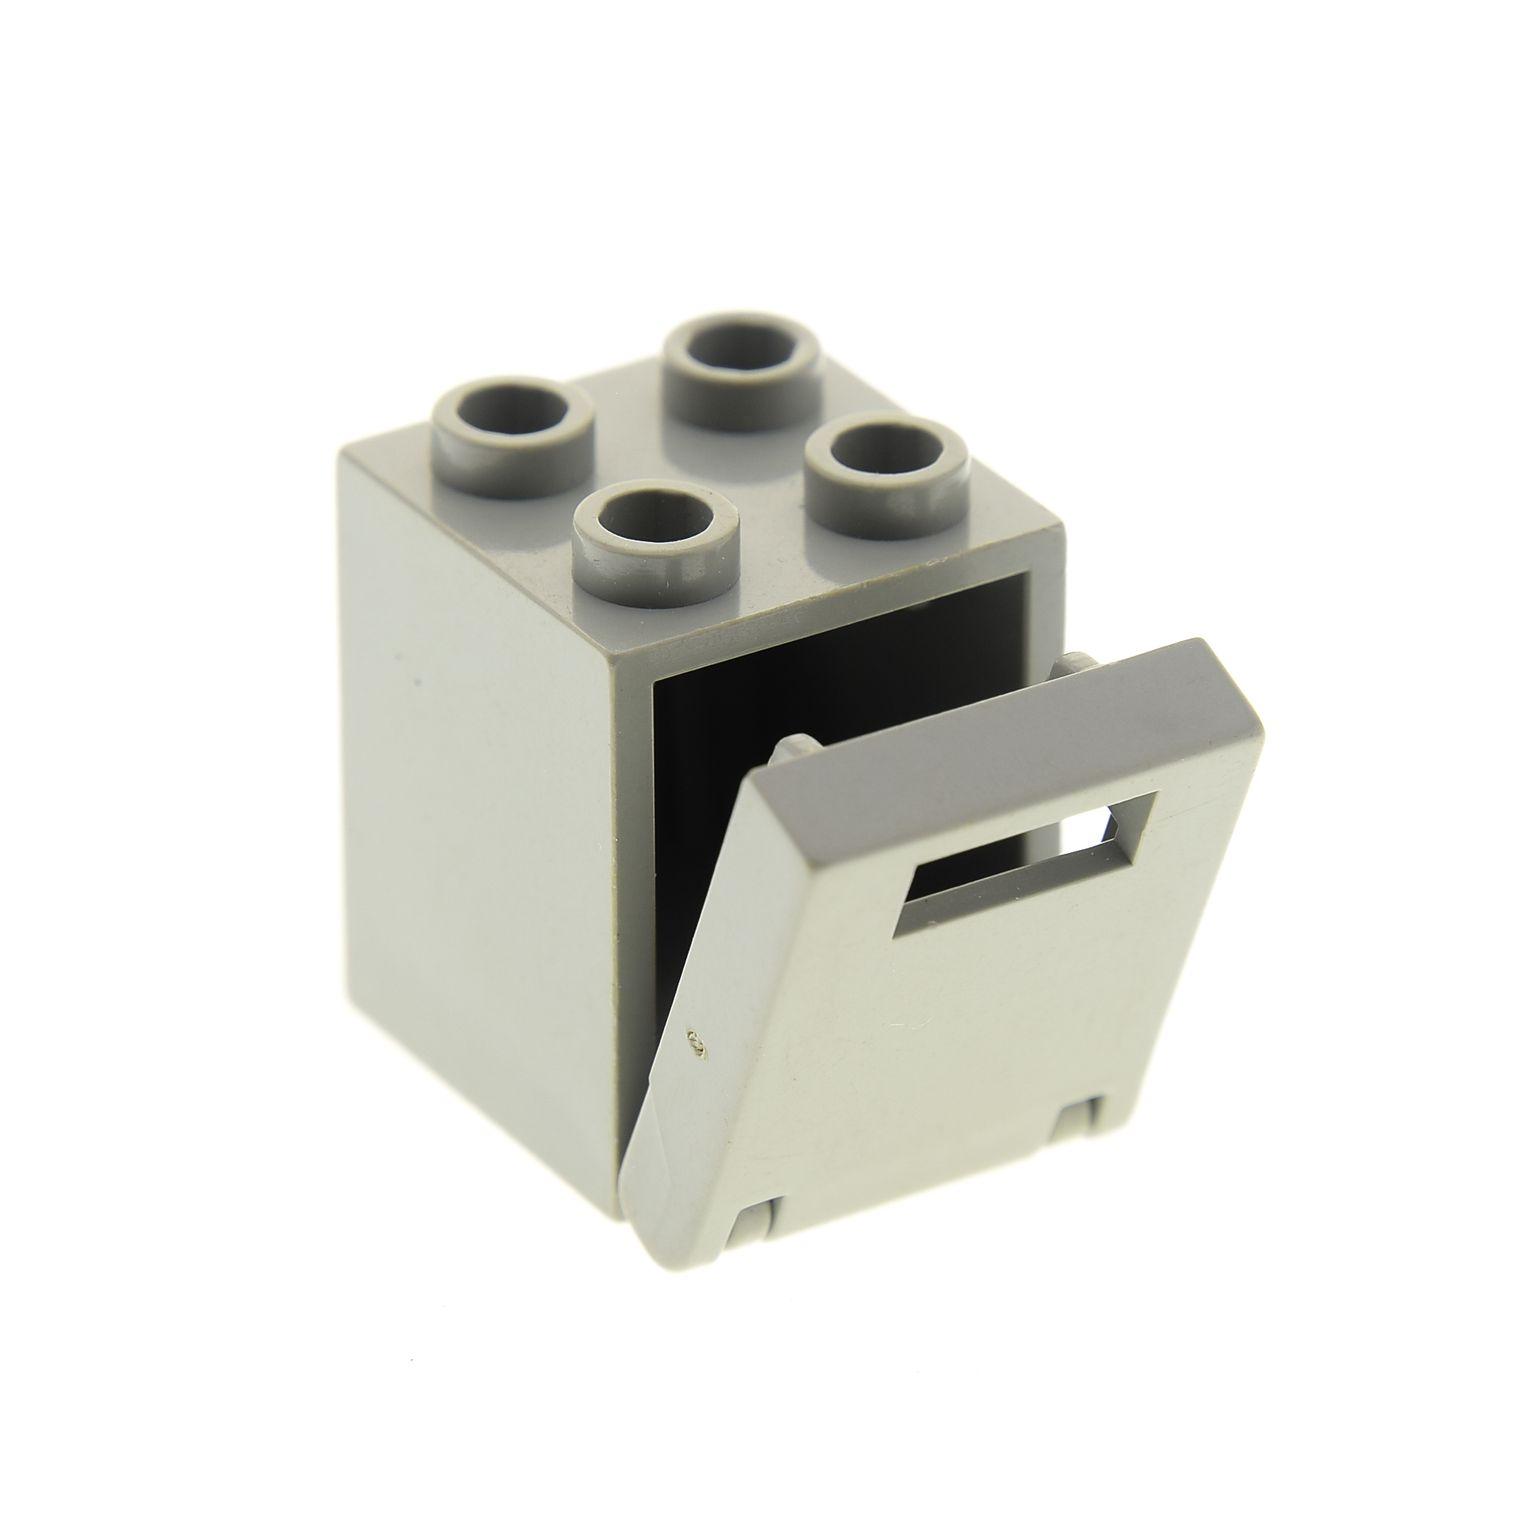 1 x Lego System Schrank neu-hell grau 2 x 2 x 2 Container Box mit Tür Deckel Kla